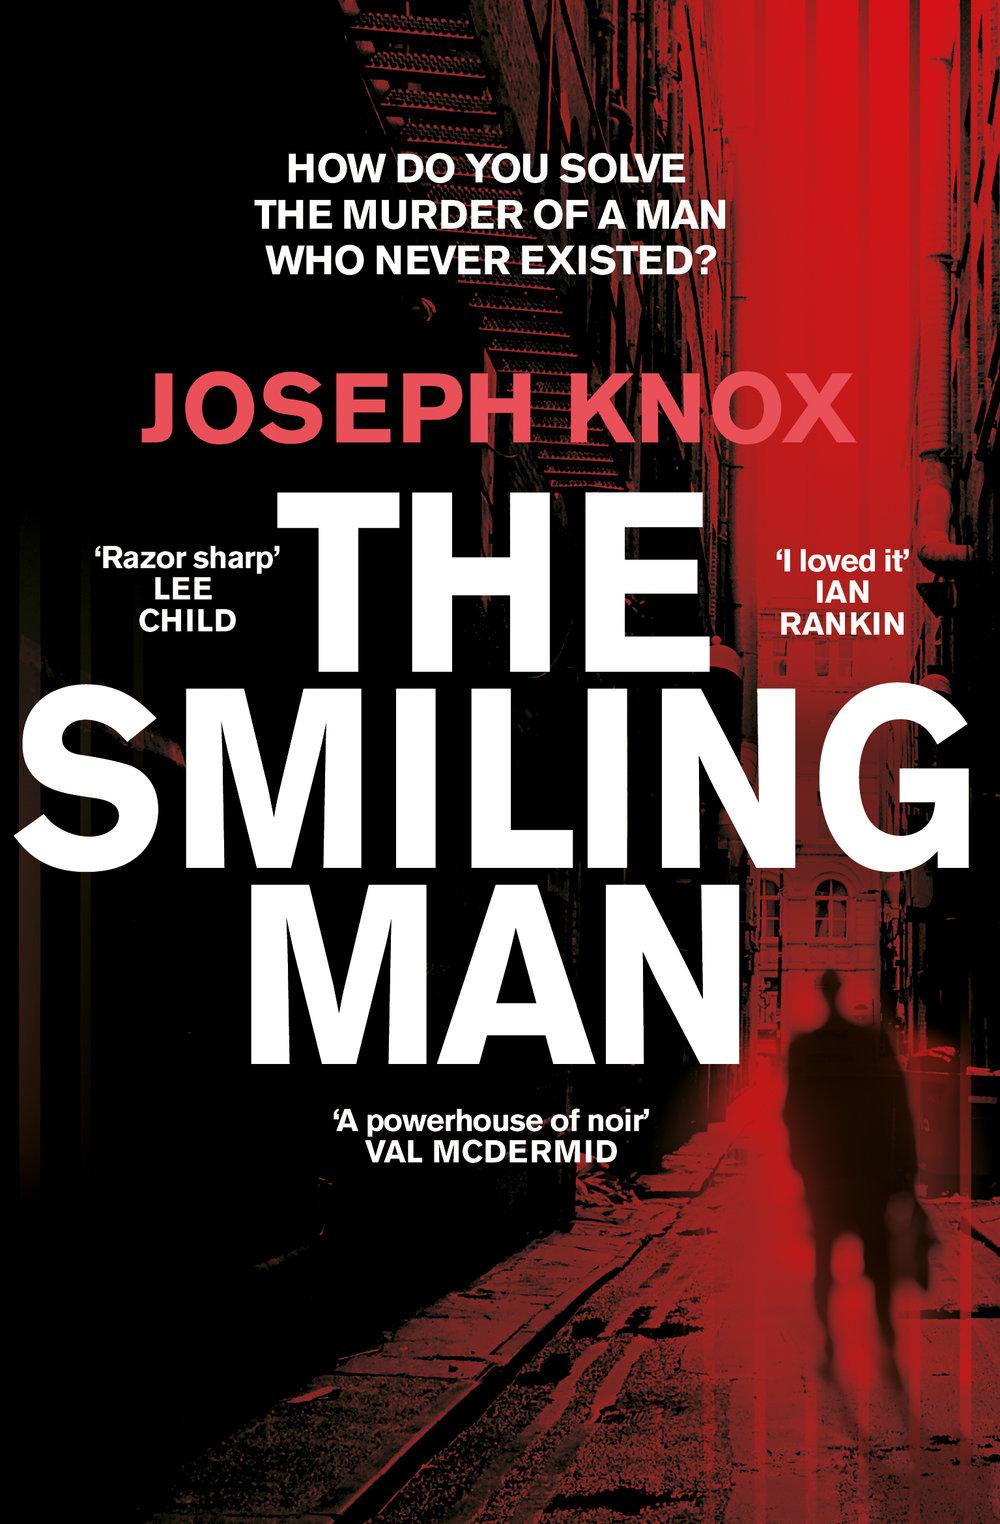 Knox - The Smiling Man pbk cover final.jpg